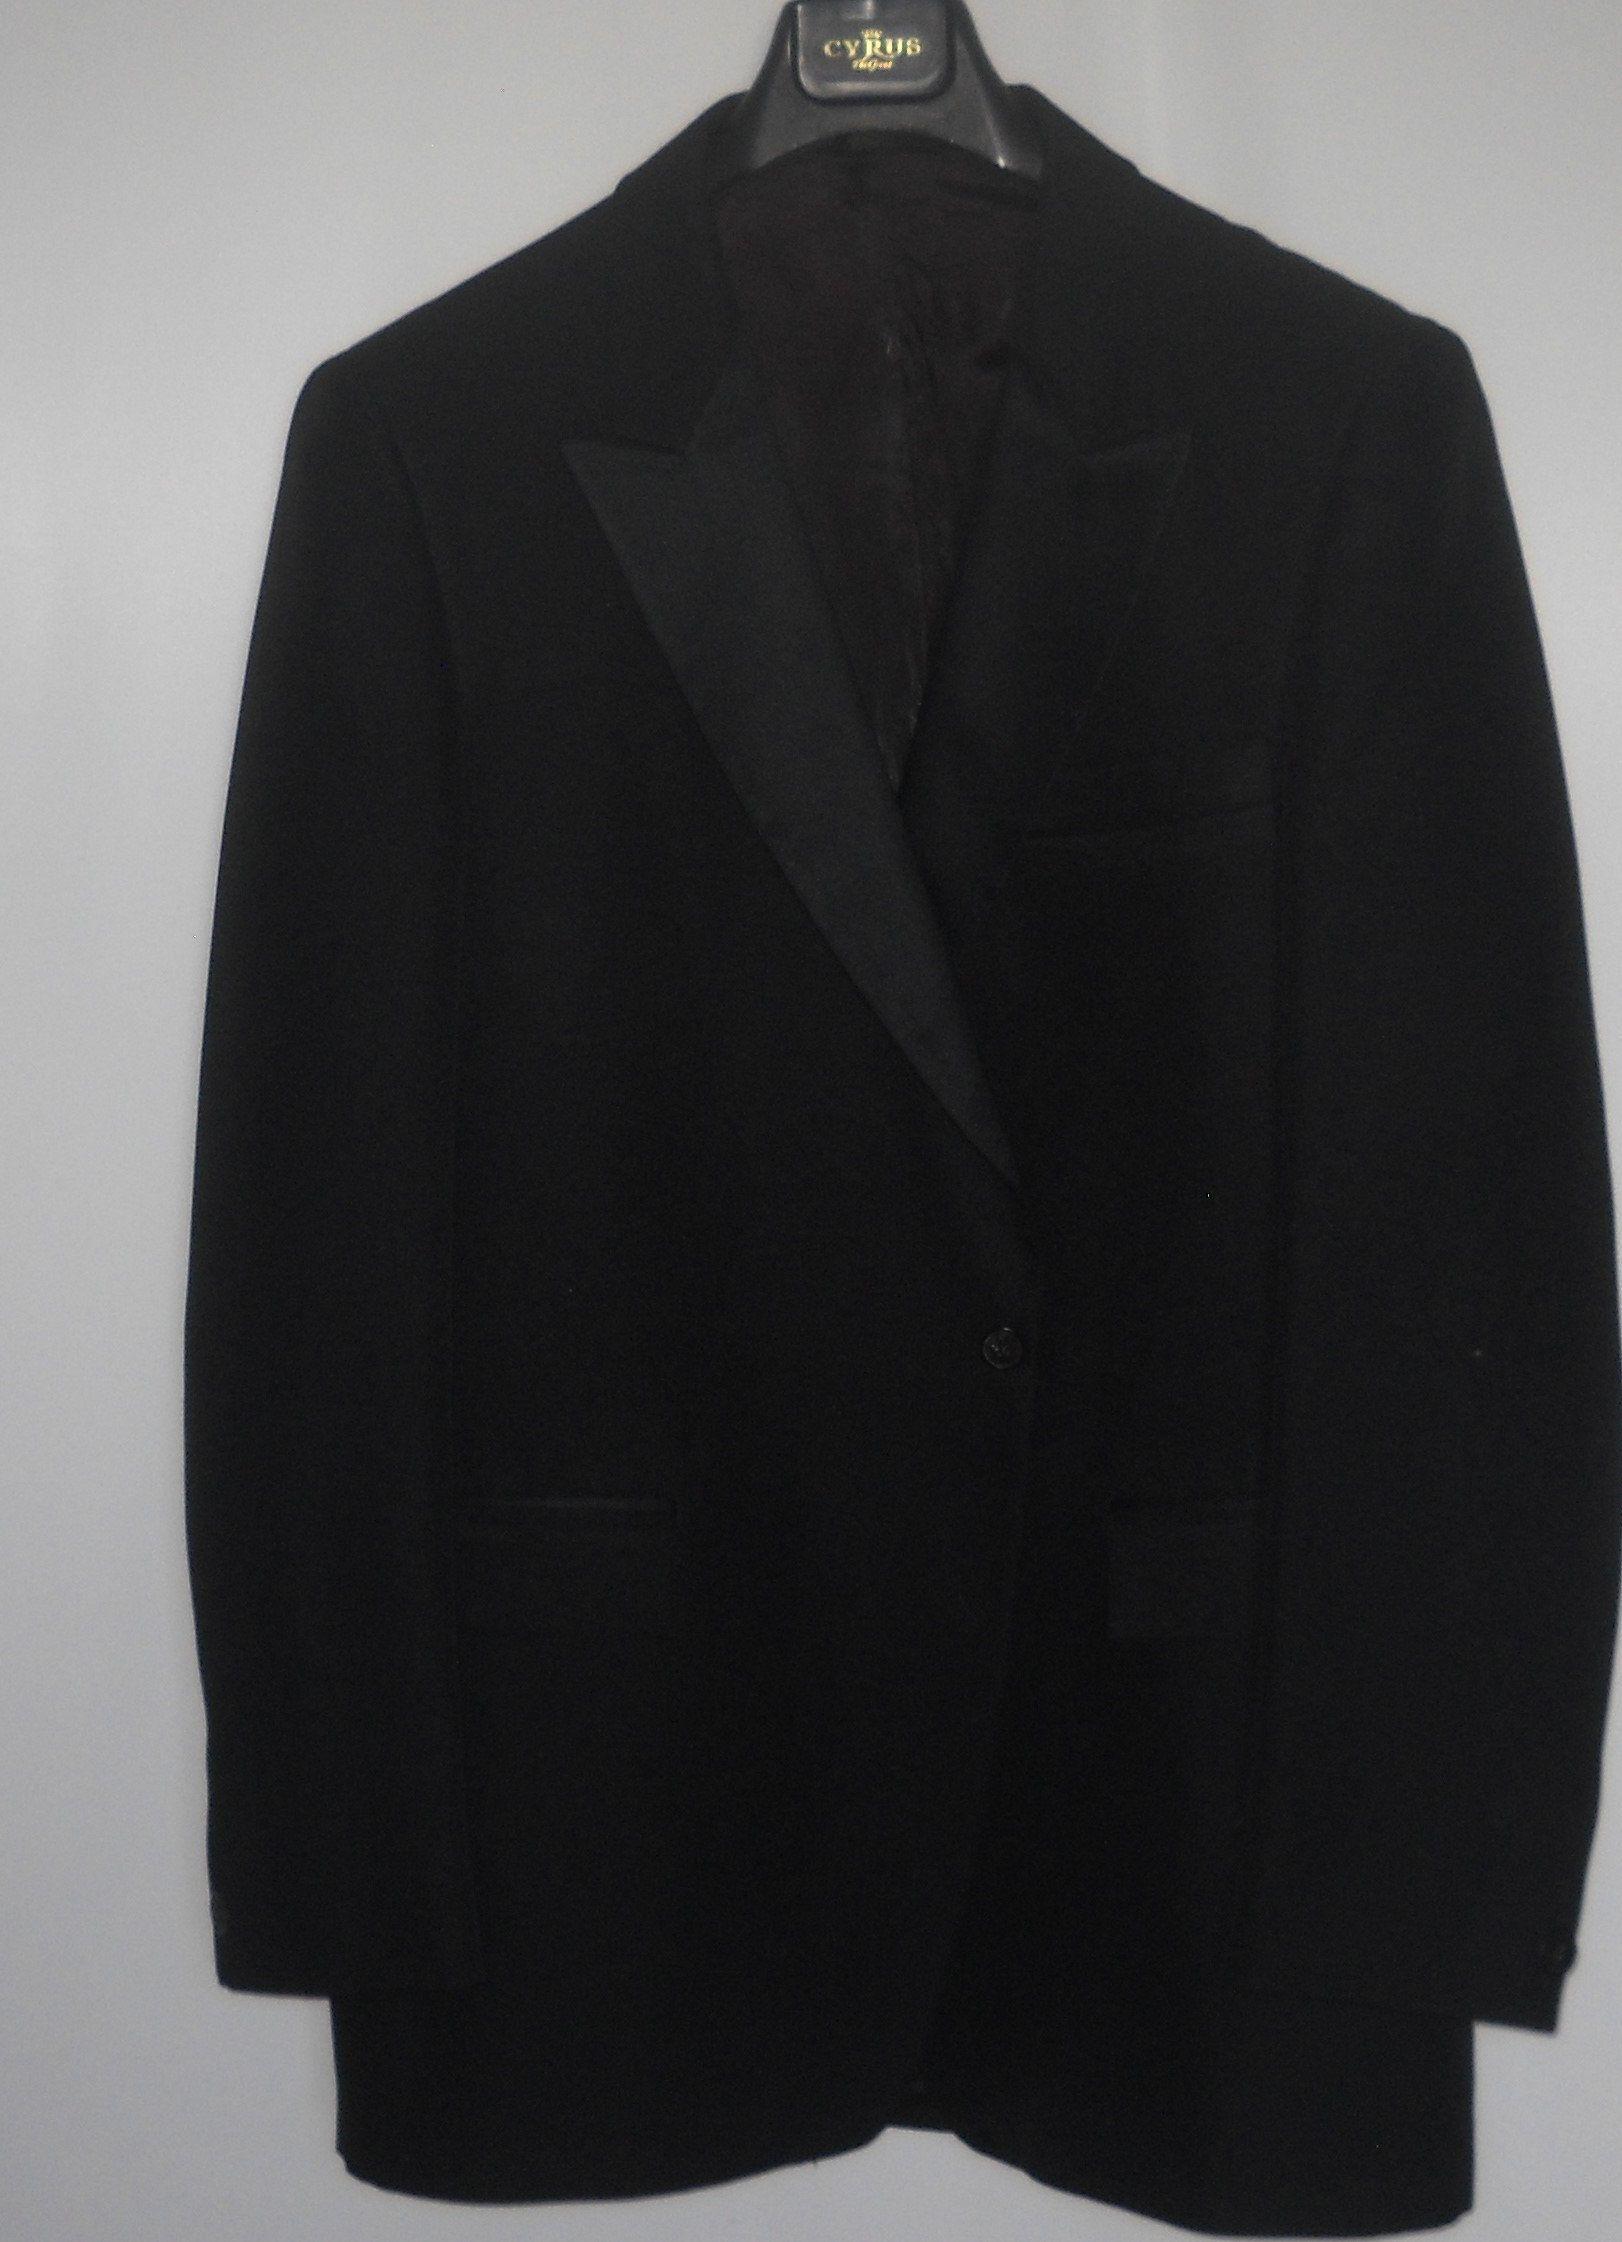 44L Long formal tuxedo jacket black After Six Burberry's 1